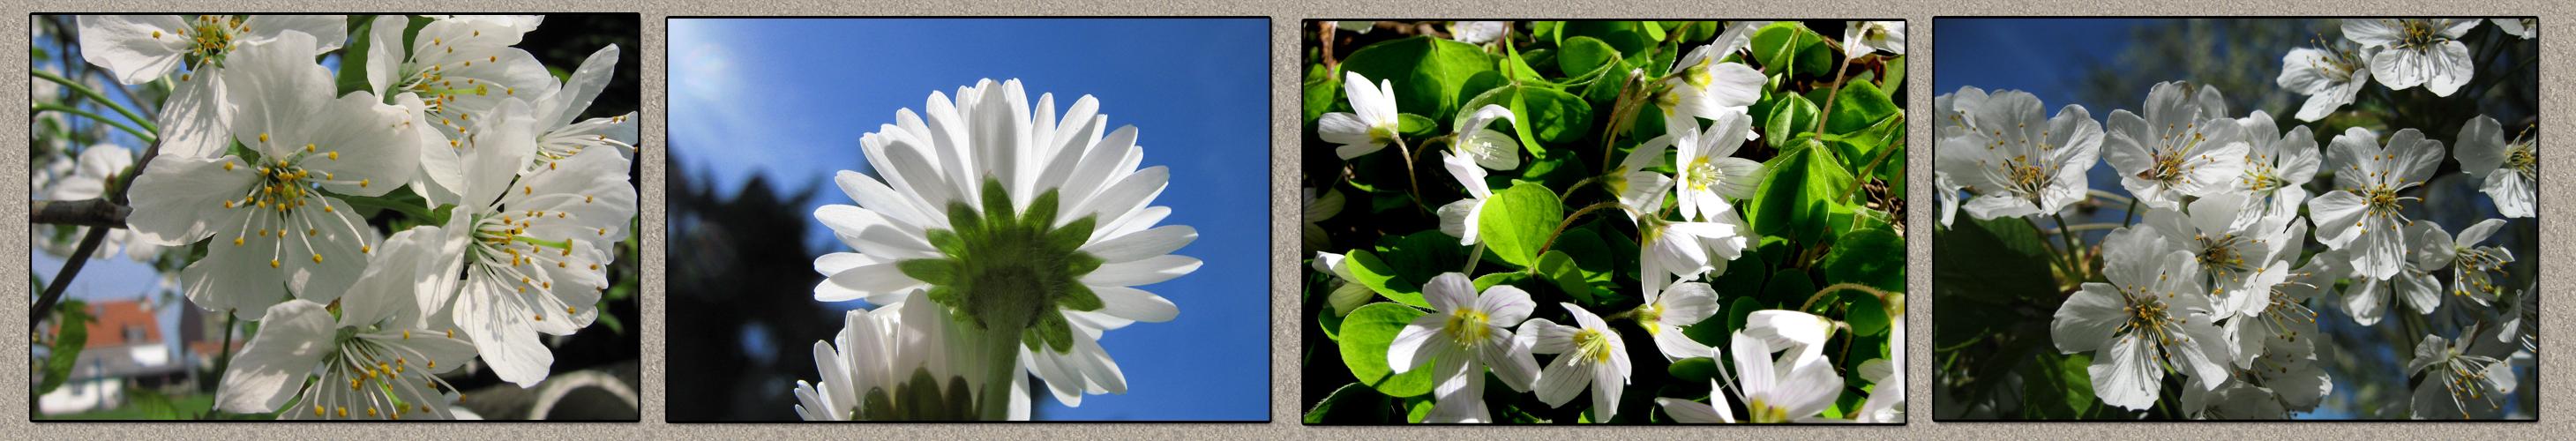 Frühling in weiß